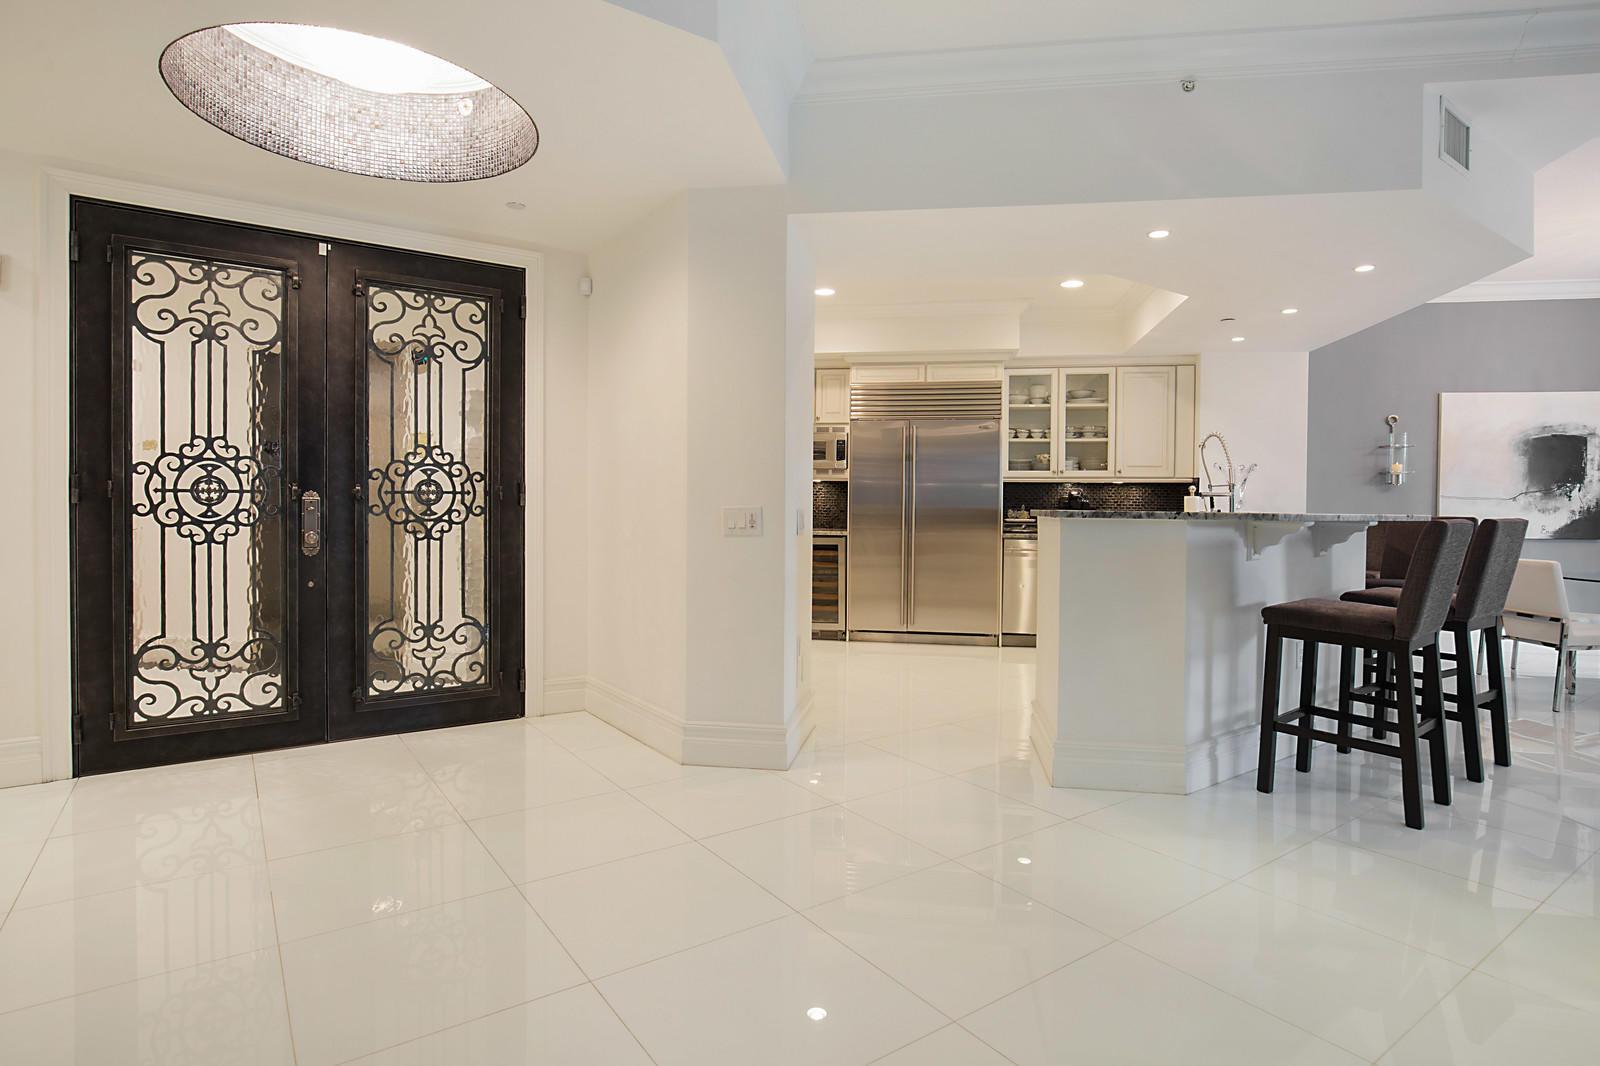 1 Ocean Boulevard, Boca Raton, Florida 33432, 3 Bedrooms Bedrooms, ,3.1 BathroomsBathrooms,Condo/Coop,For Sale,MERIDIAN,Ocean,2,RX-10504436